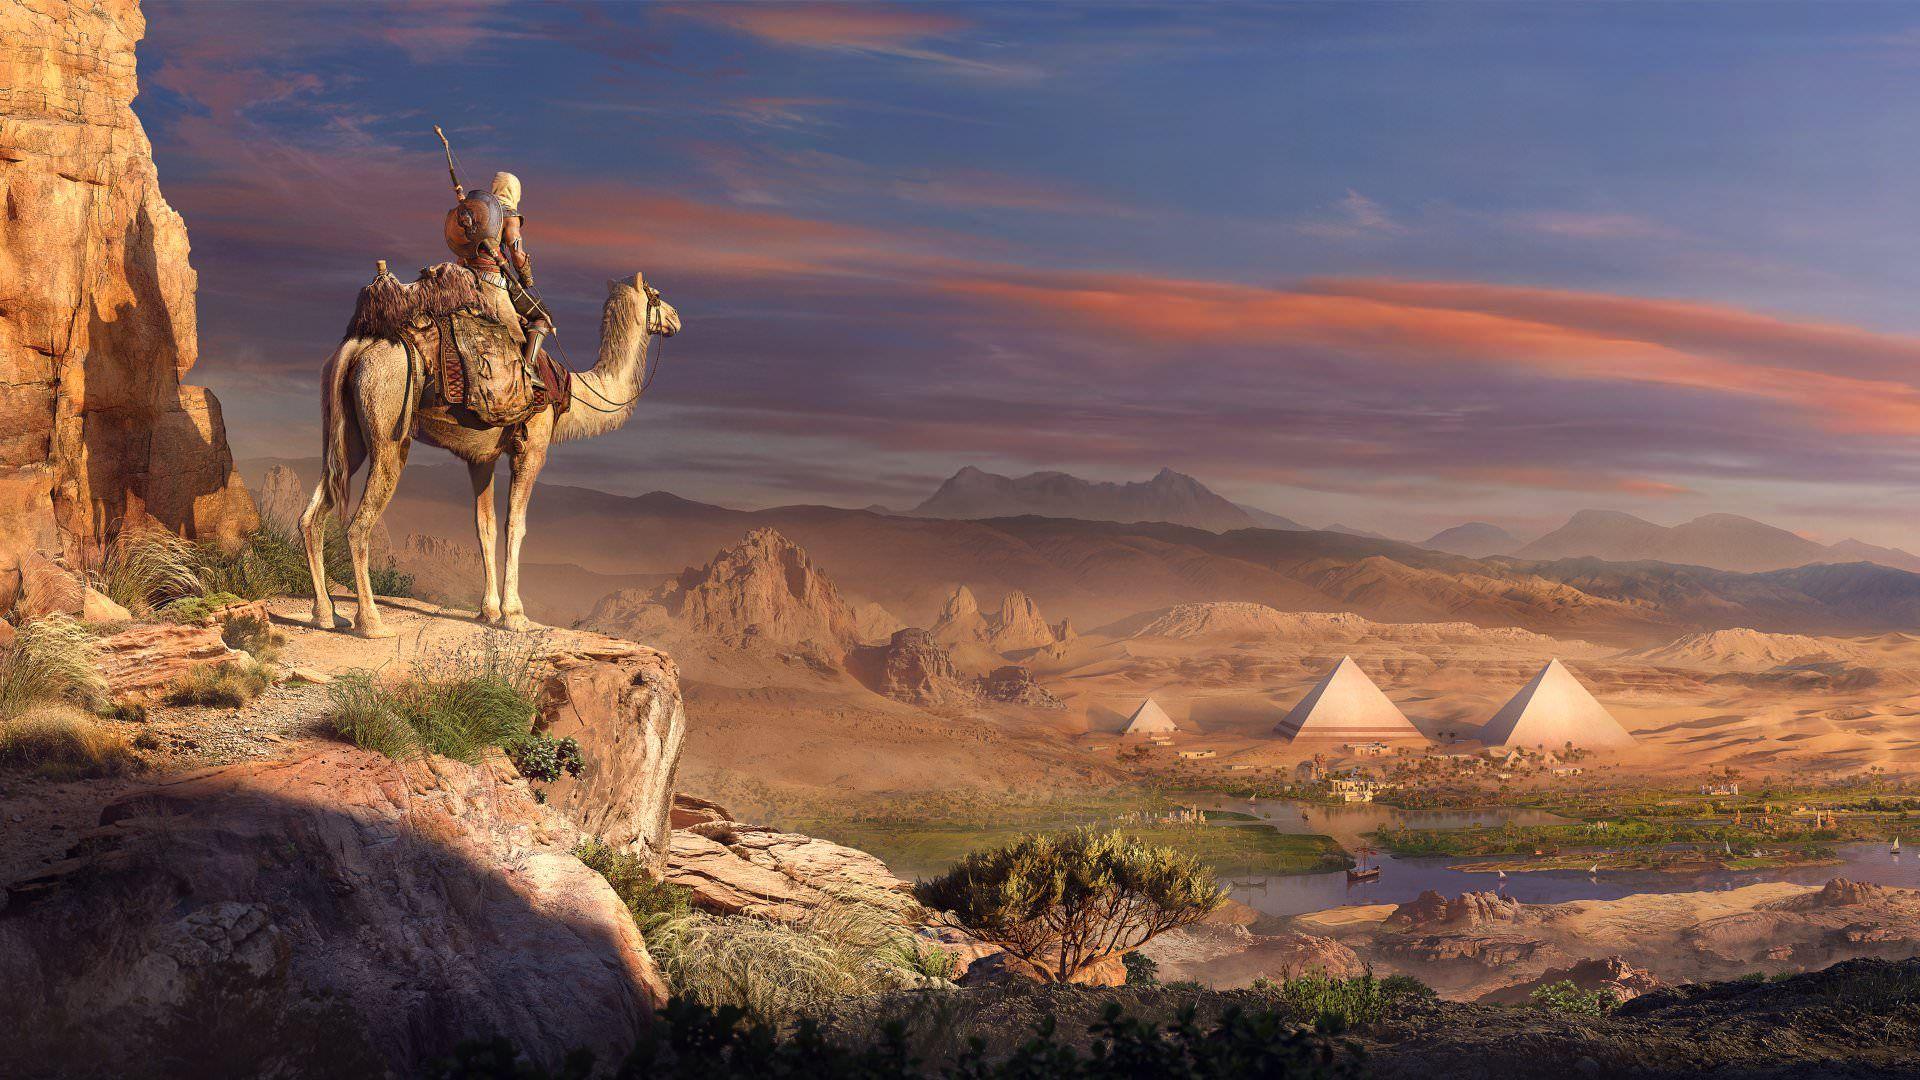 Assassin S Creed Origins Full Hd Wallpaper 1920x1080 Assassins